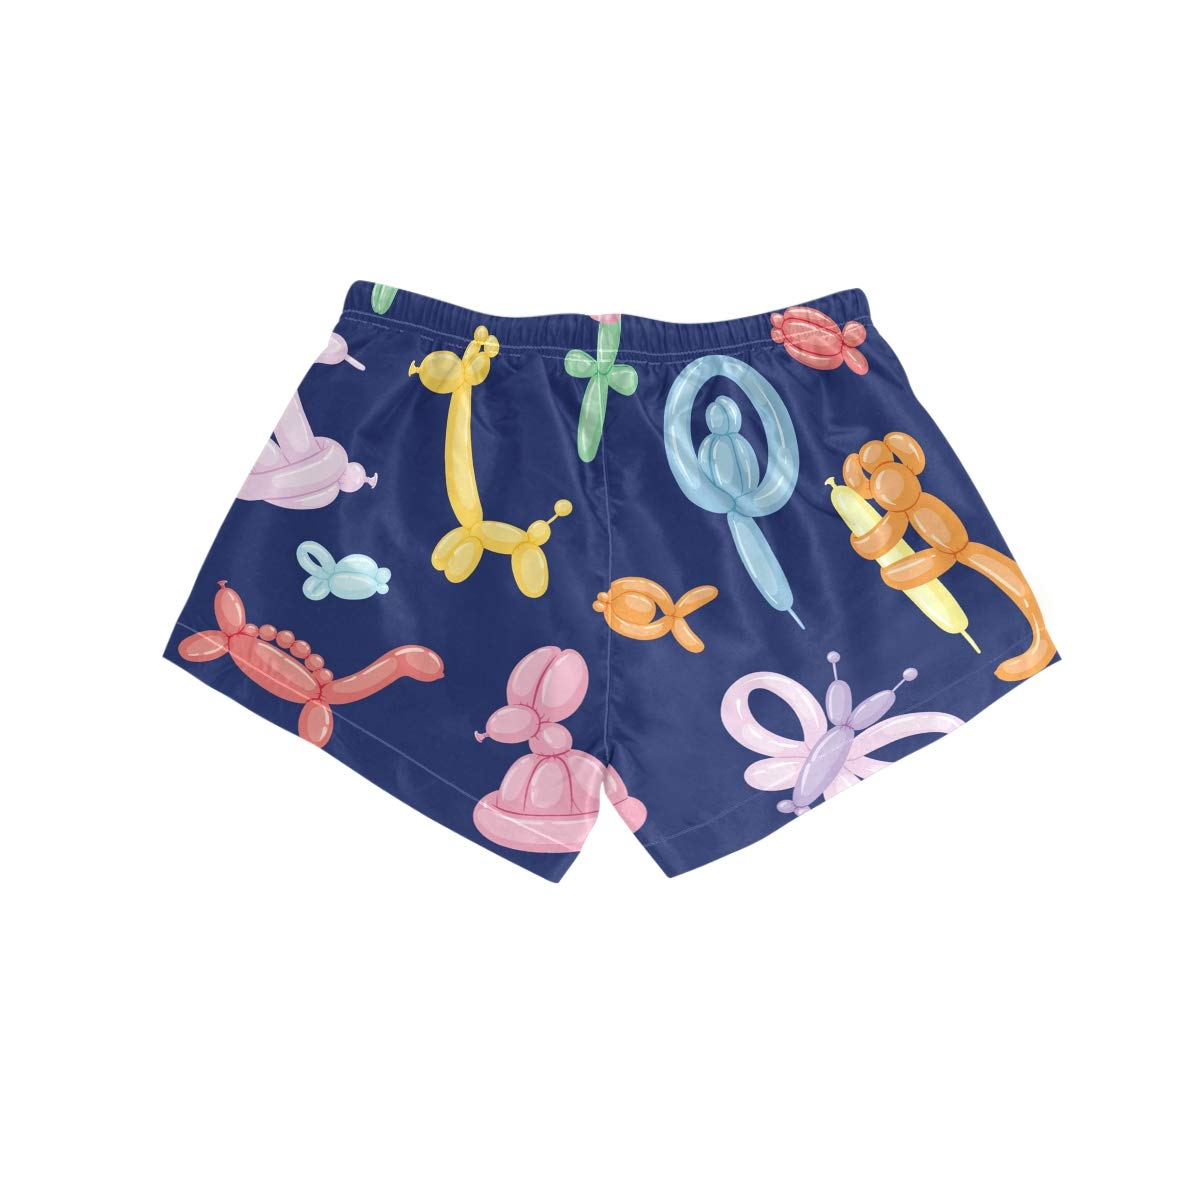 Women Swim Trunks Balloon Animal Dog Flower Candy Snakes Beach Board Shorts